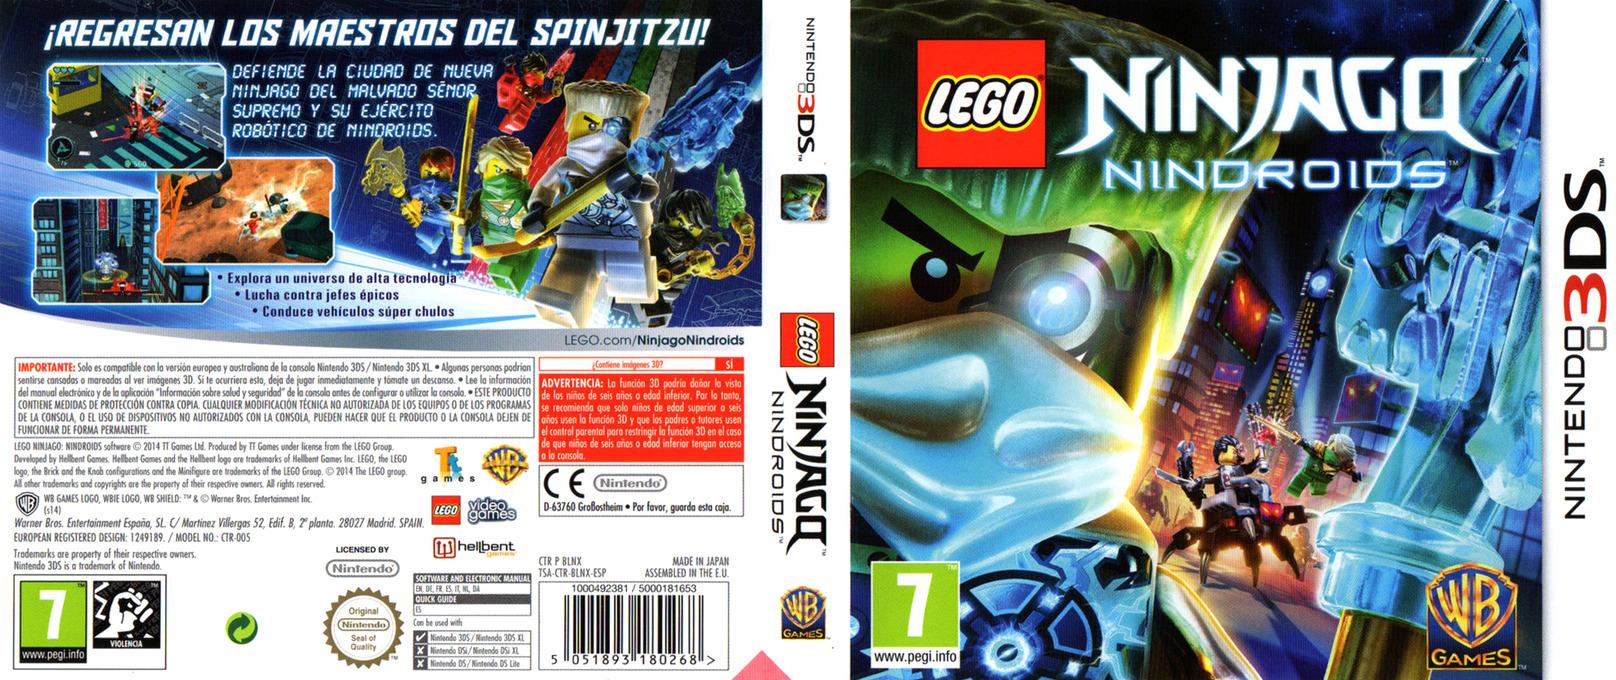 LEGO Ninjago - Nindroids 3DS coverfullHQ (BLNX)